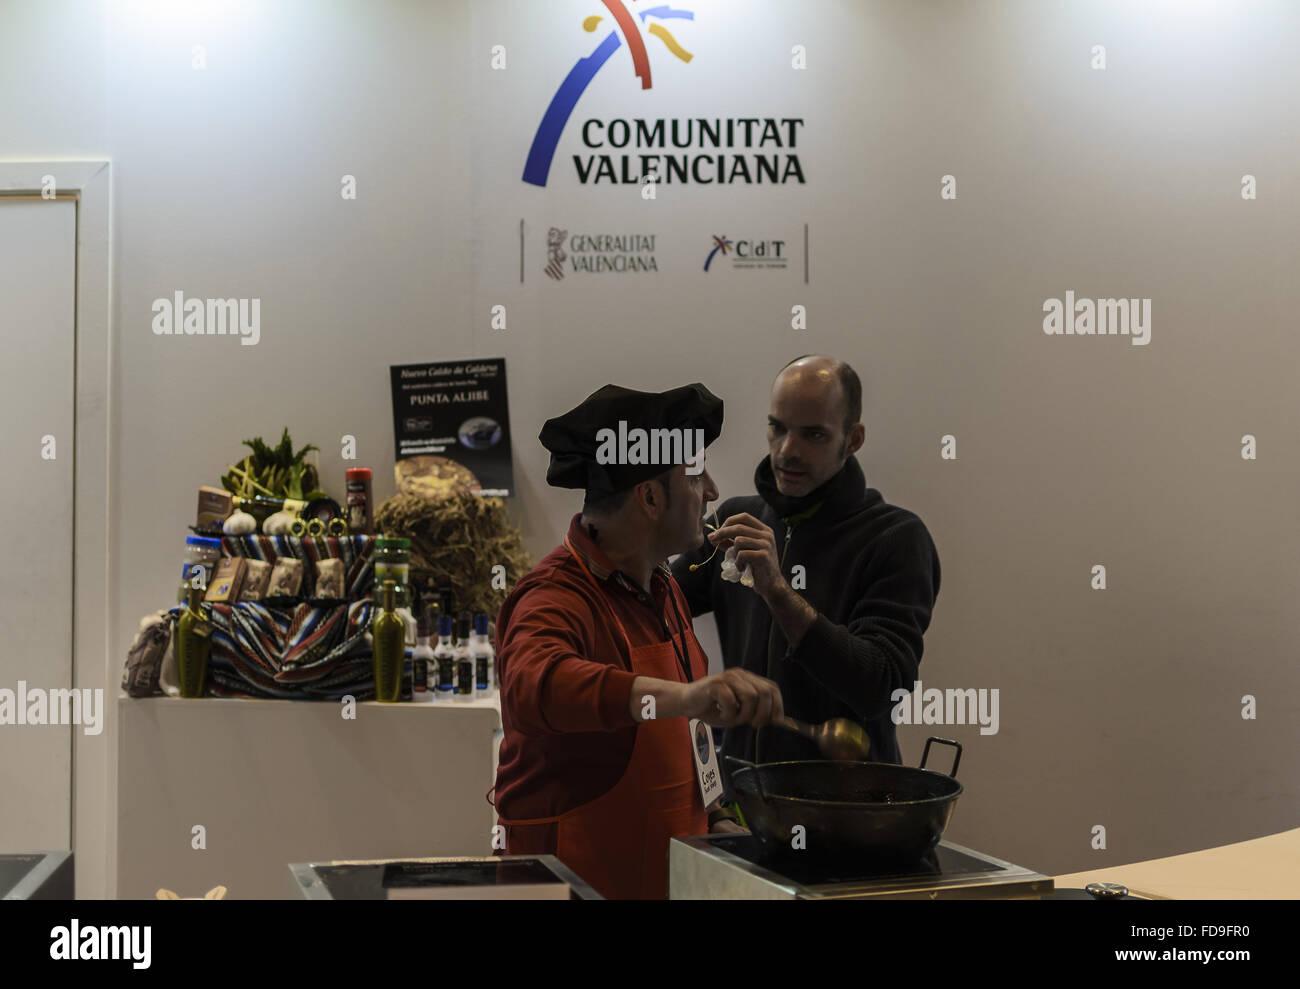 A black cap view in Fitur fair, Madrid, Spain - Stock Image